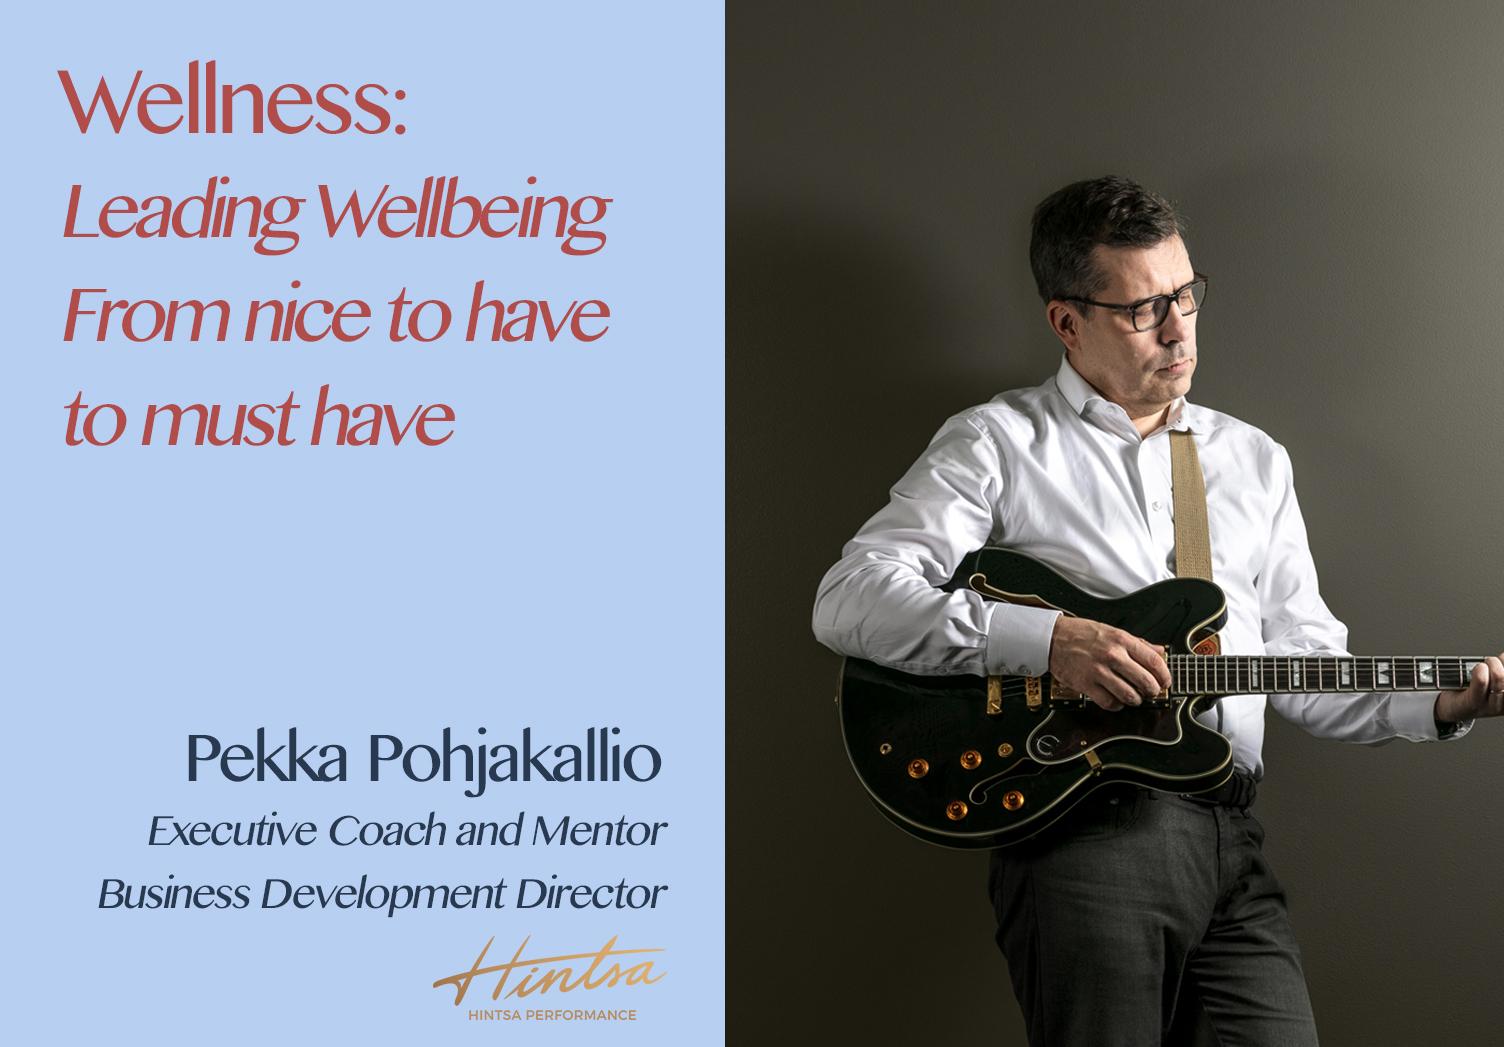 Hospitality Resilience Series on Wellbeing with Pekka Pohjakallio